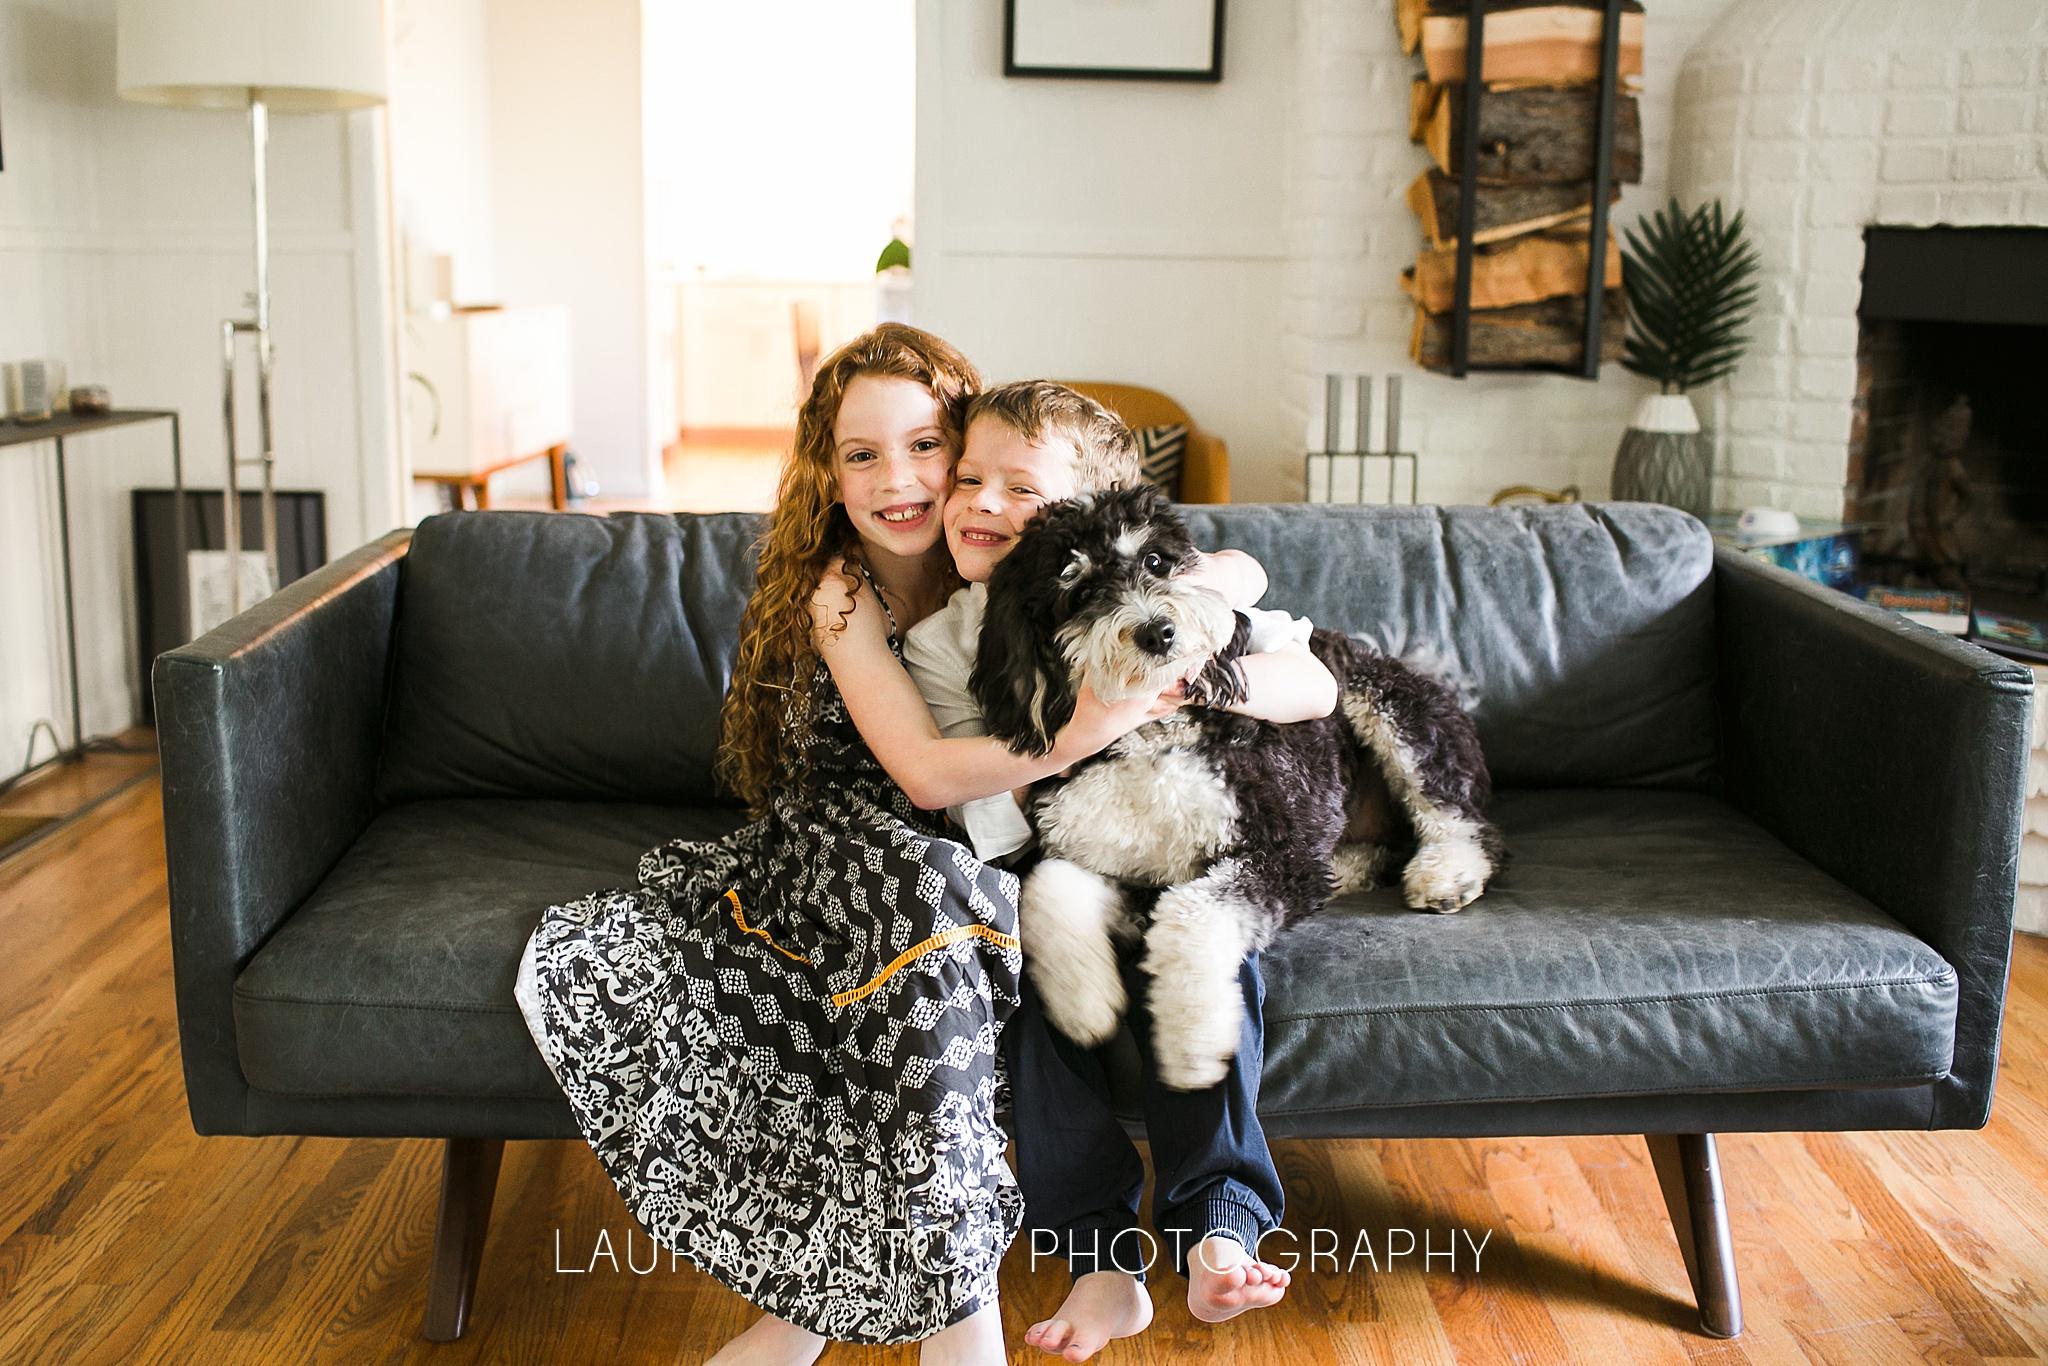 Laura Santos Photography Portland Oregon Family Photographer_0955.jpg